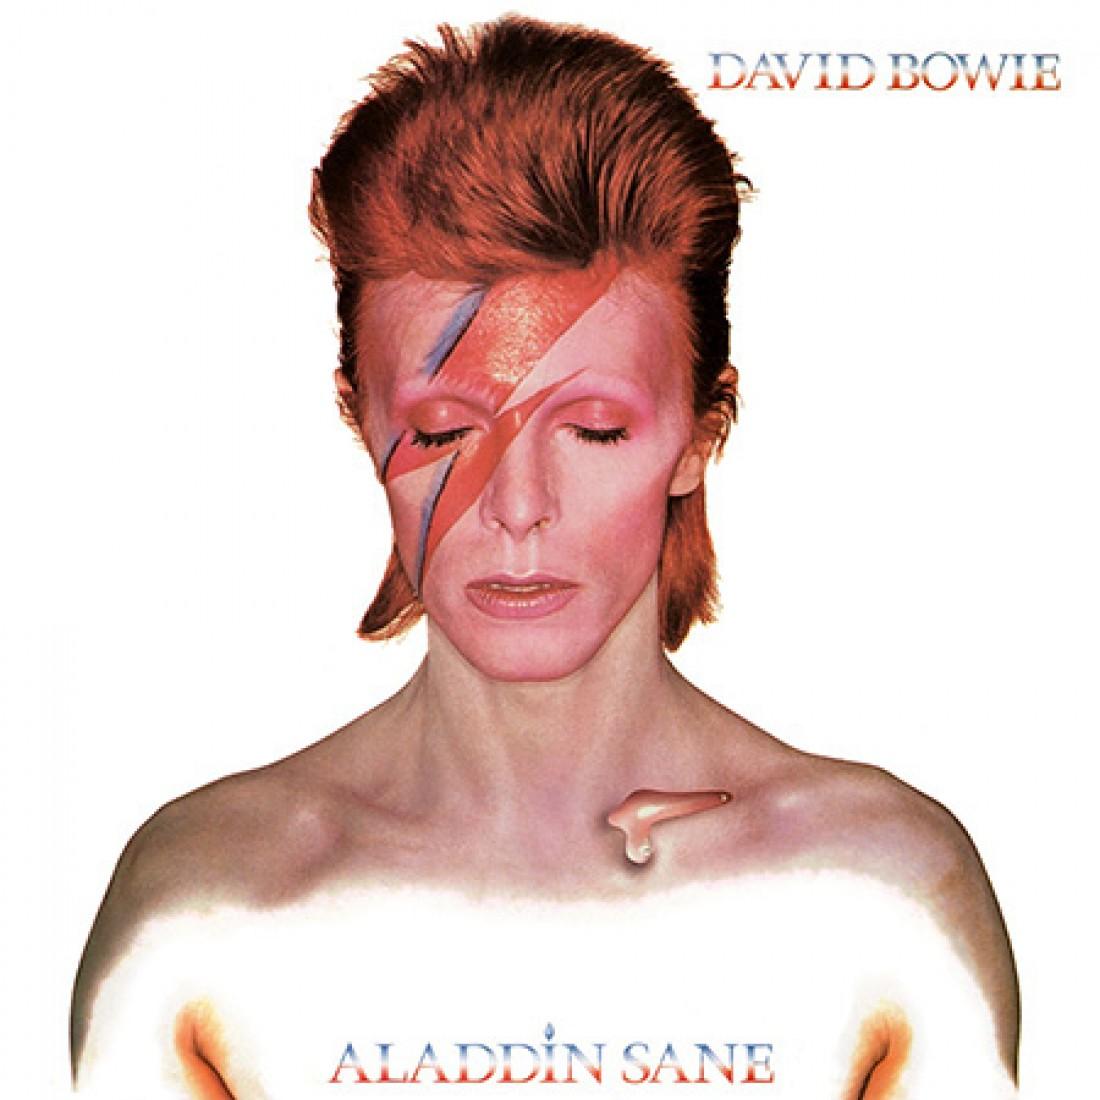 Обложка альбома Дэвида Боуи